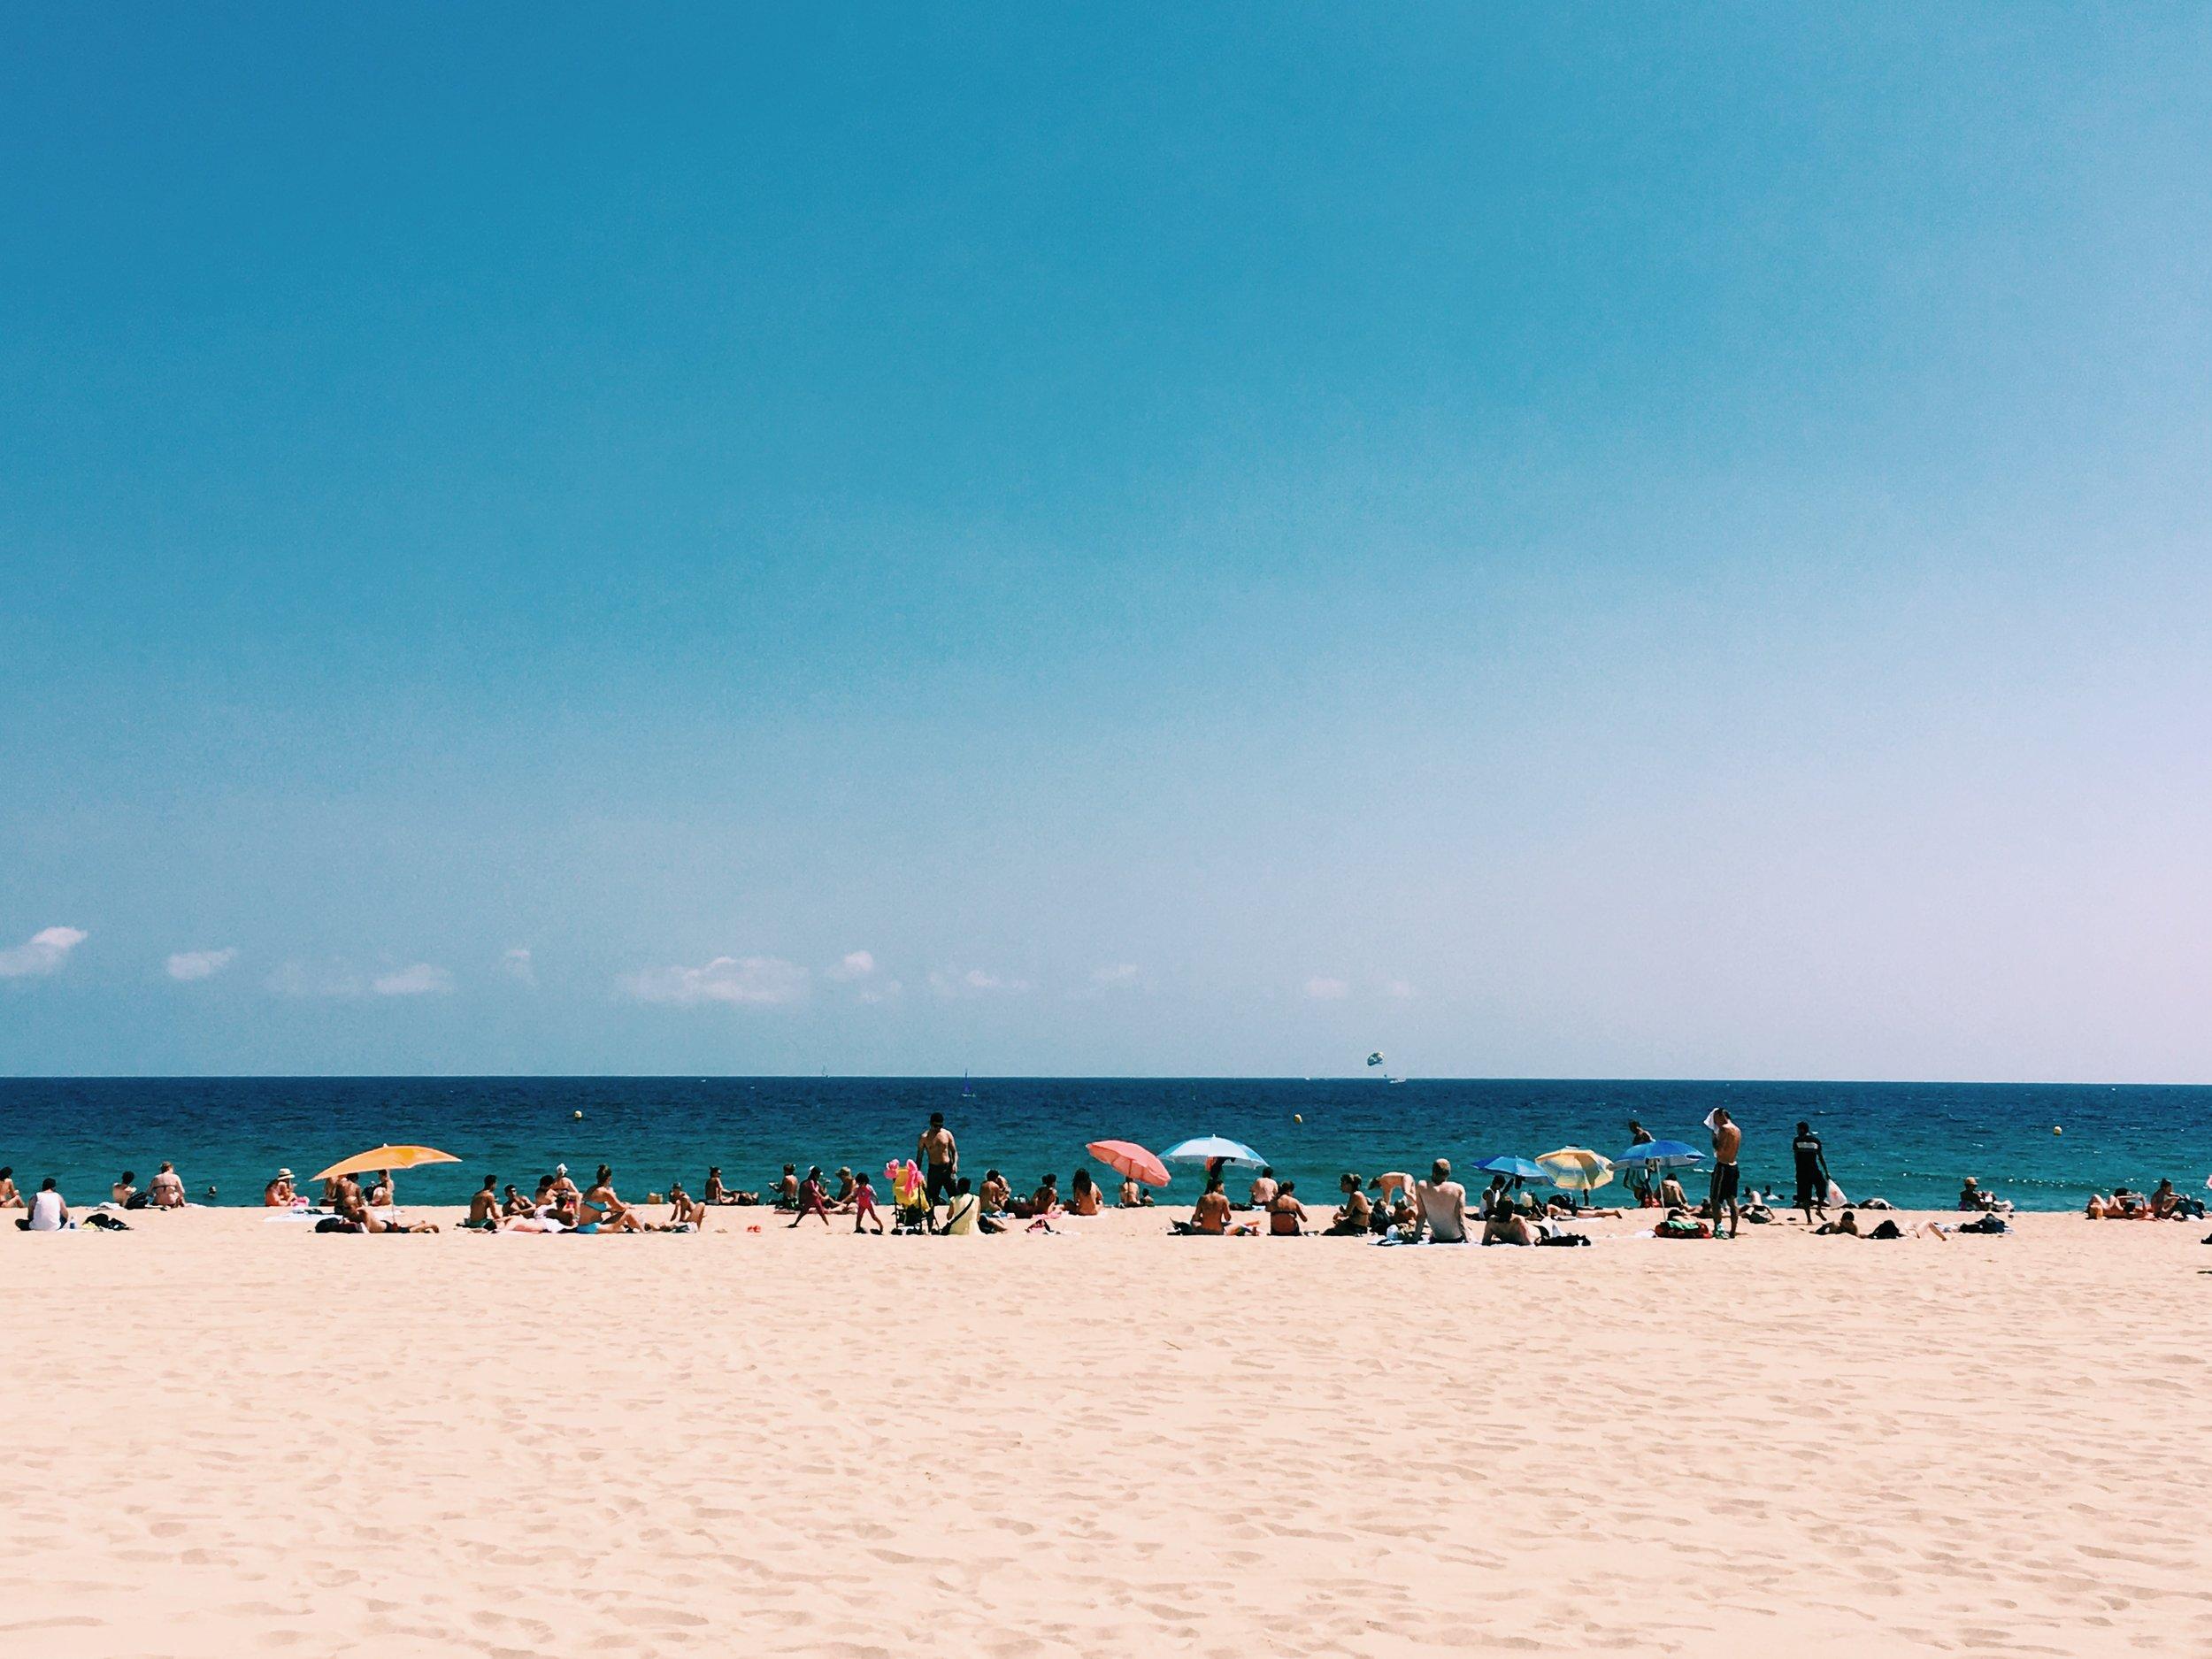 The beach in Barcelona